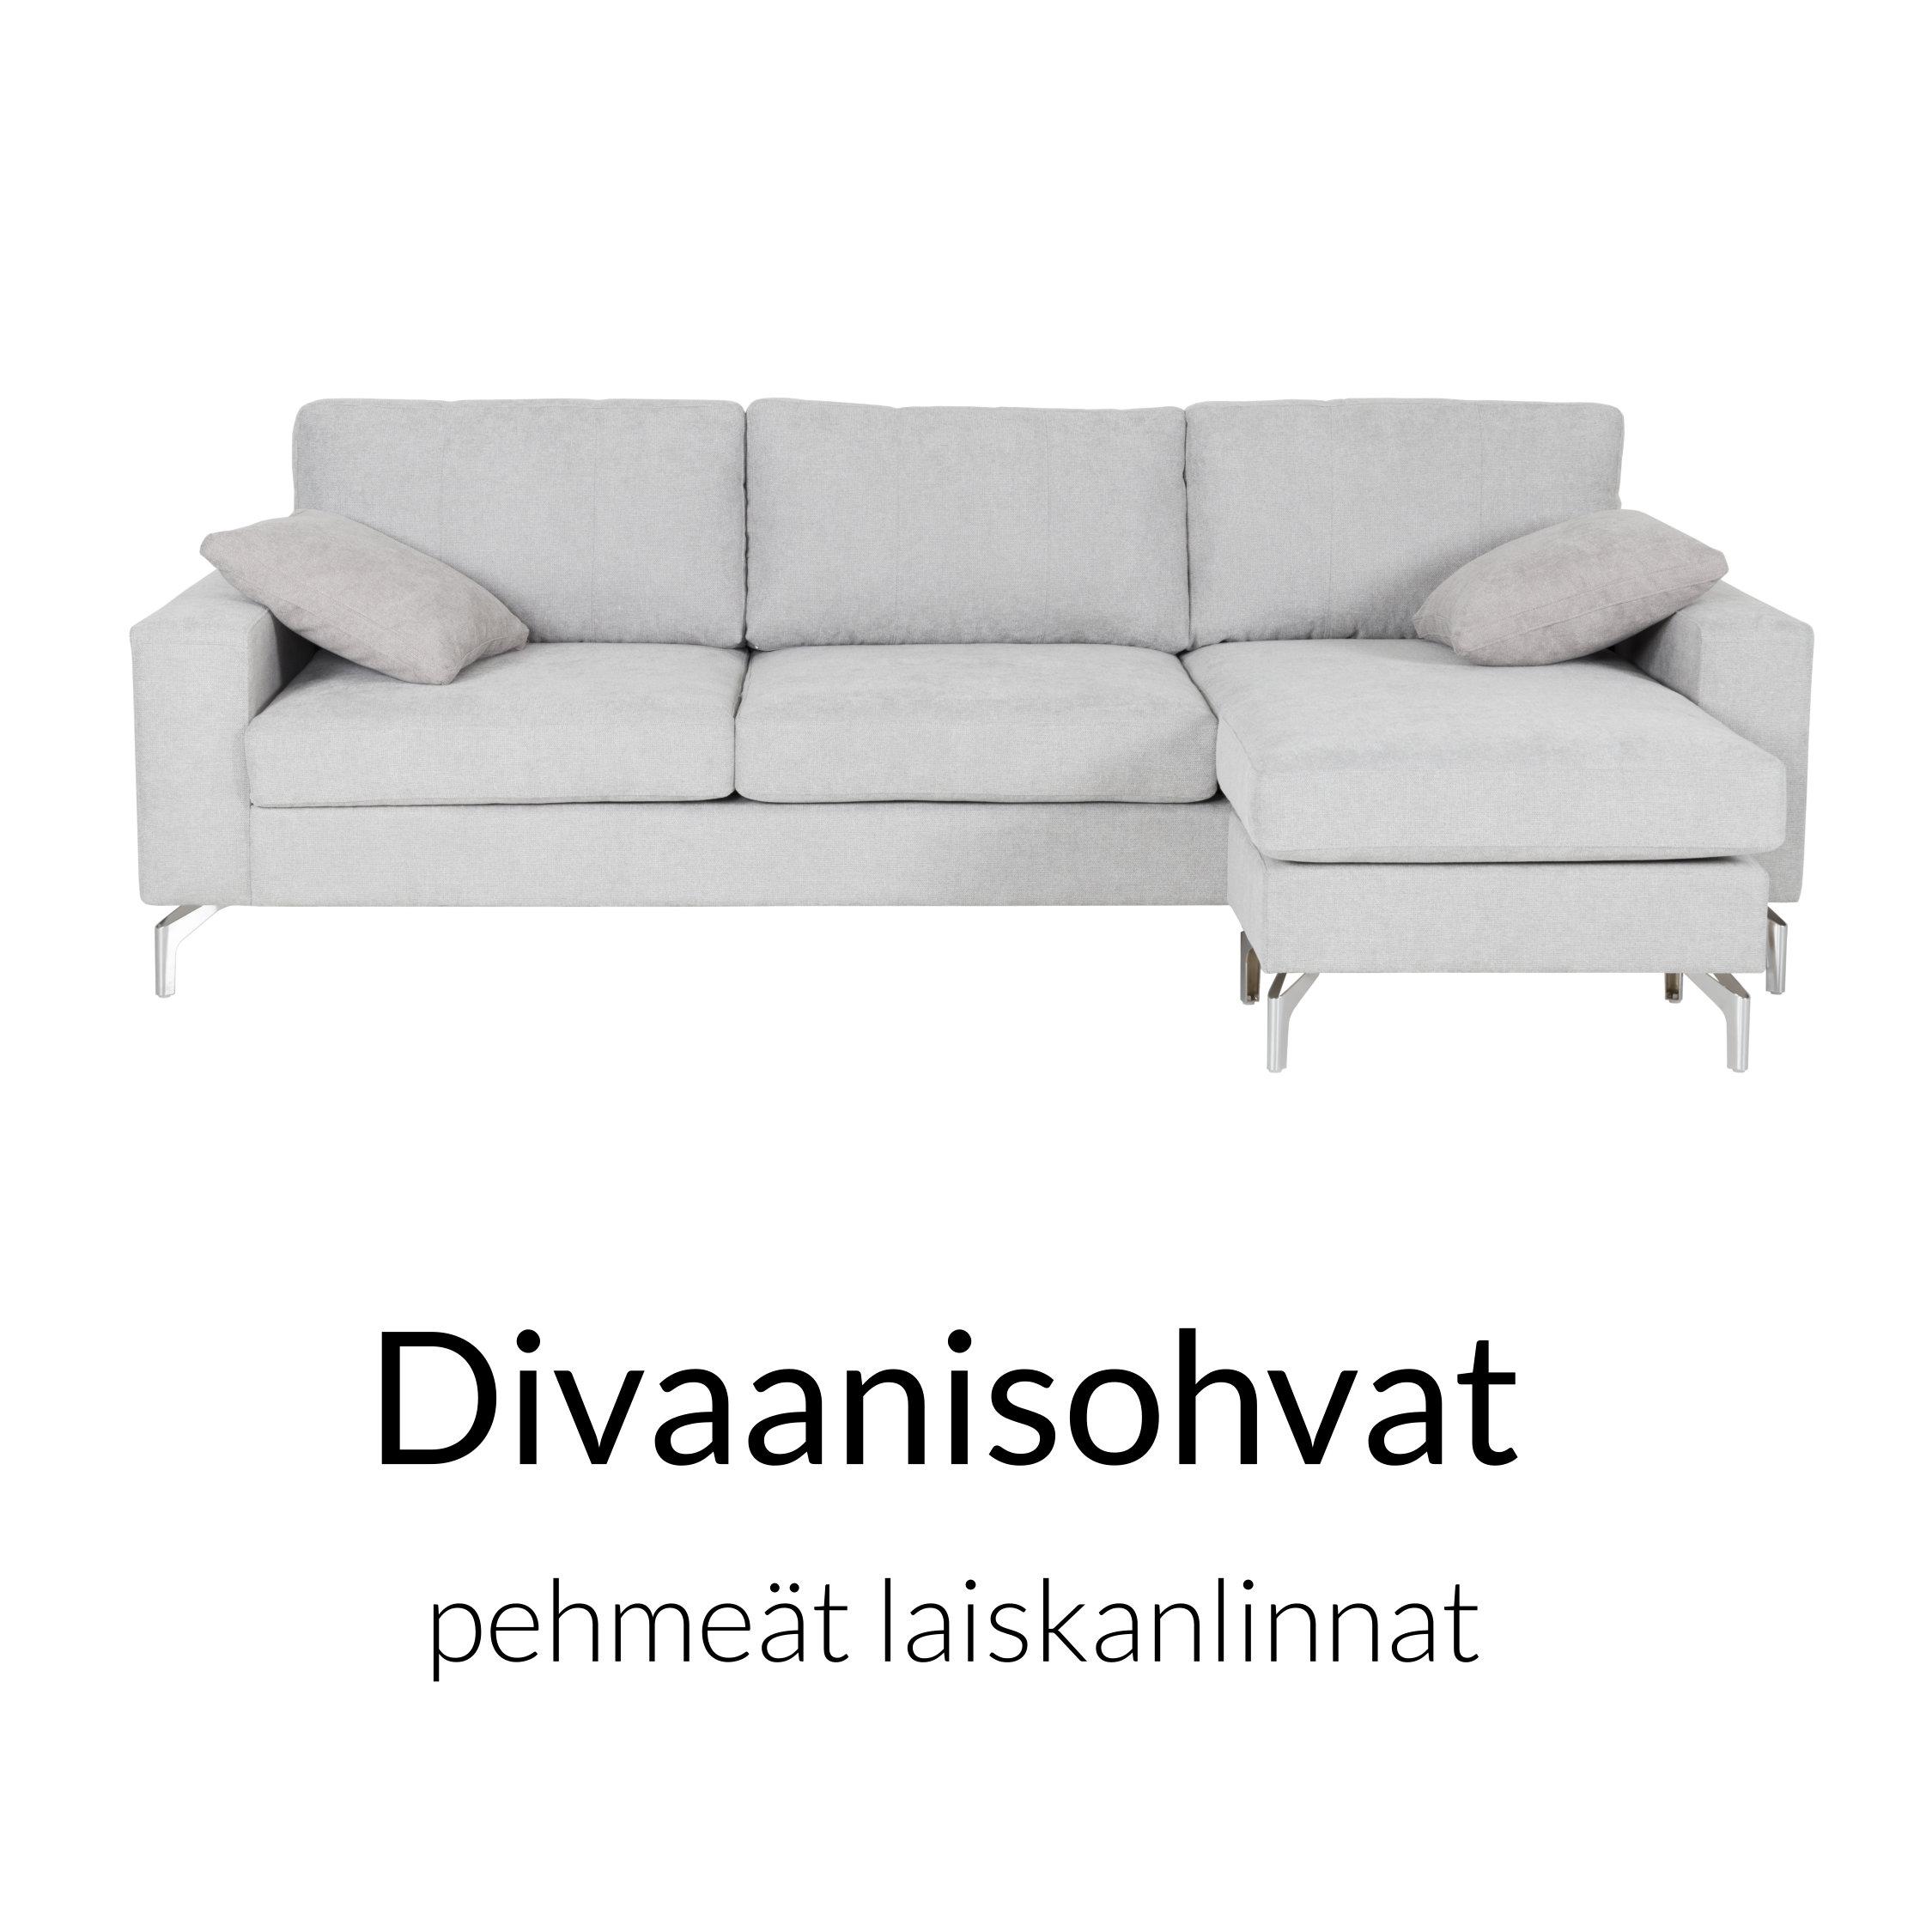 Divaanisohvat